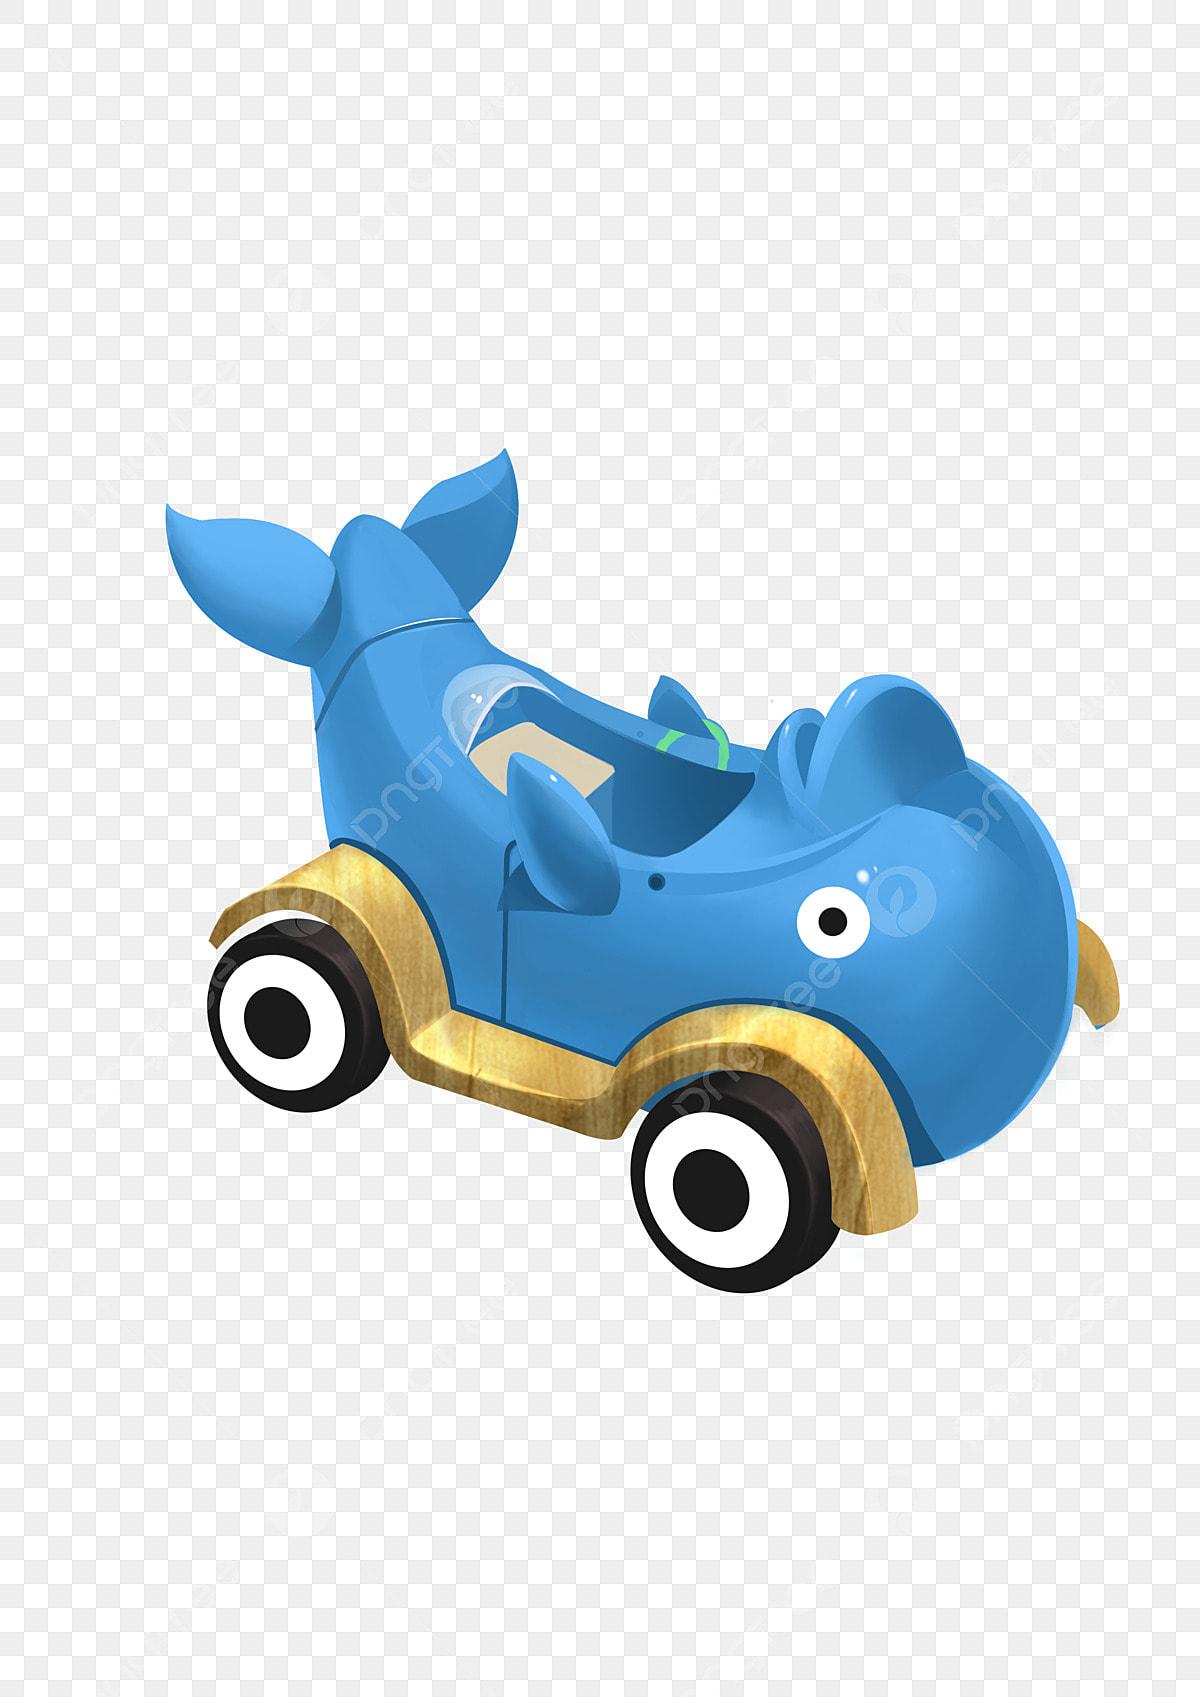 Gambar Kereta Versi Kartun Gambar Kereta Kartun Ilustrasi Lumba Lumba Kereta Q Versi Kereta Ilustrasi Dolphin Biru Kereta Tangan Dilukis